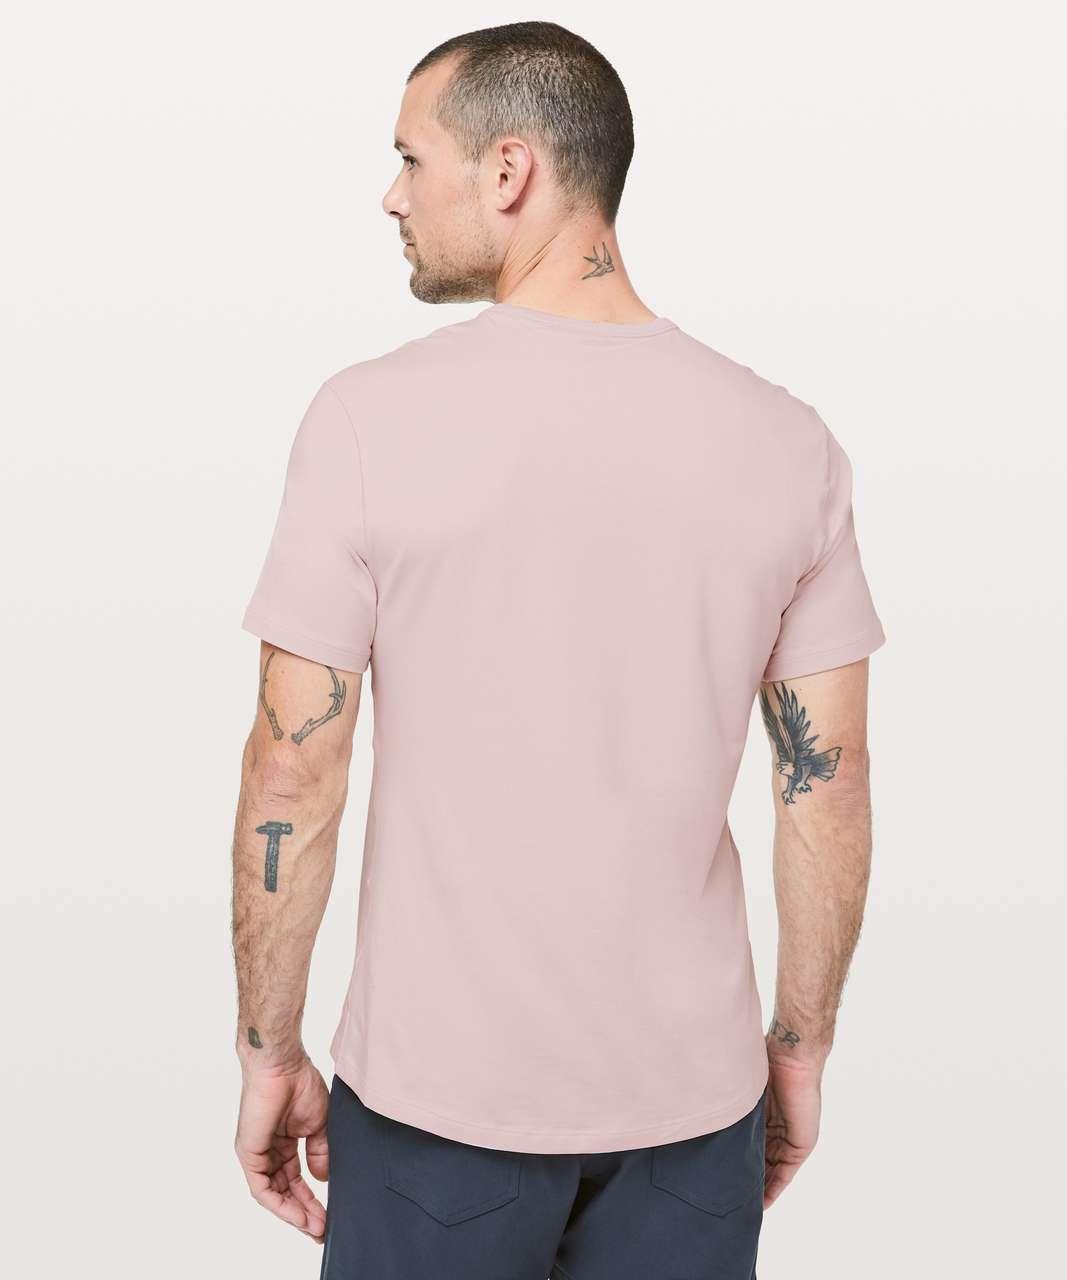 Lululemon 5 Year Basic Tee *Updated Fit - Misty Pink